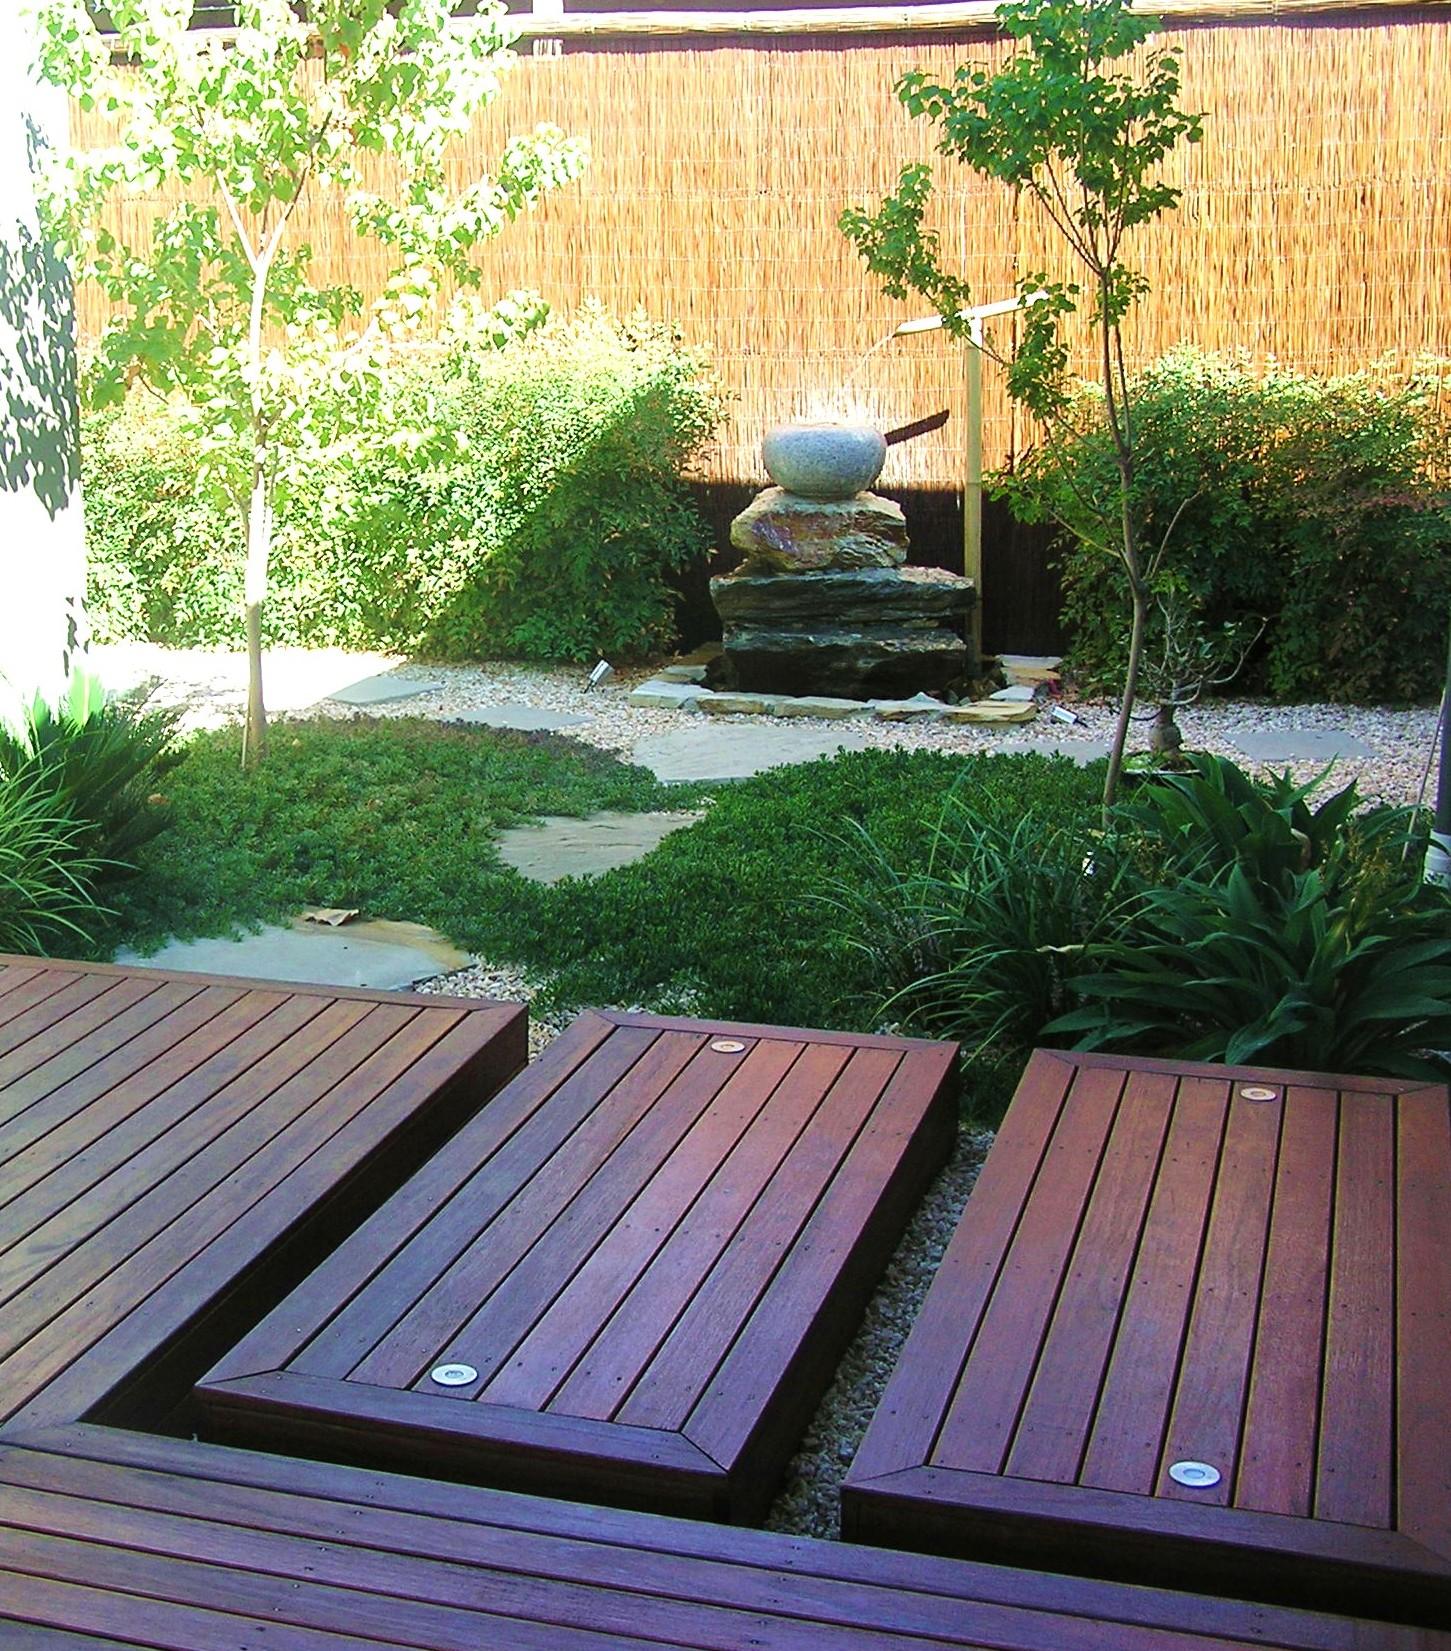 Glenelg north caroline dawes garden design adelaide for Courtyard landscaping adelaide